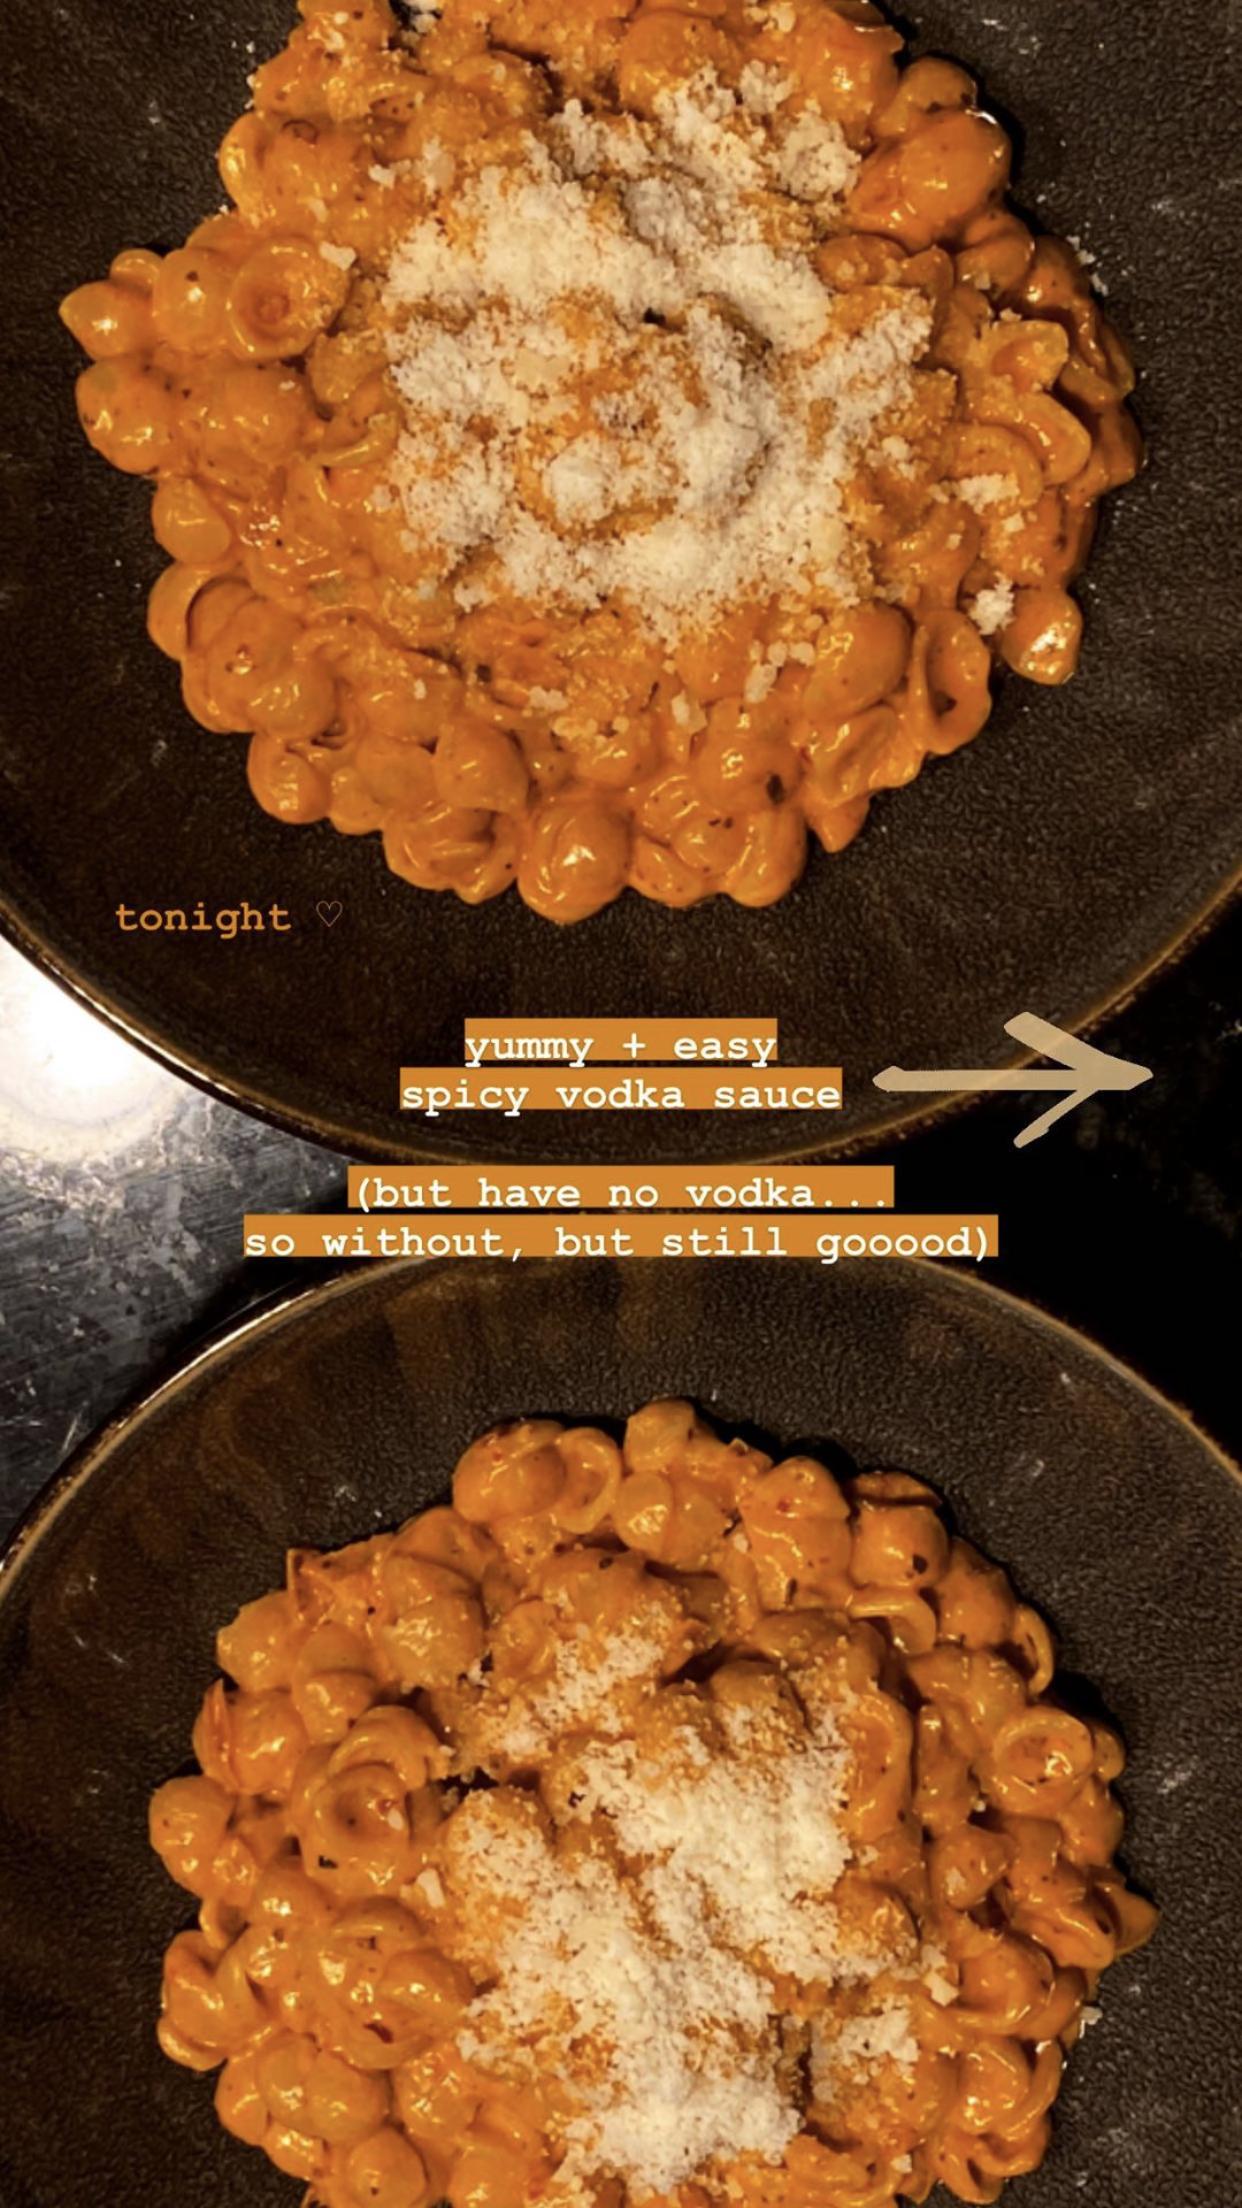 Gigi Hadid S Homemade Vodka Sauce Recipe Looks Tasty Af In 2020 Pasta Recipes Vodka Pasta Pasta